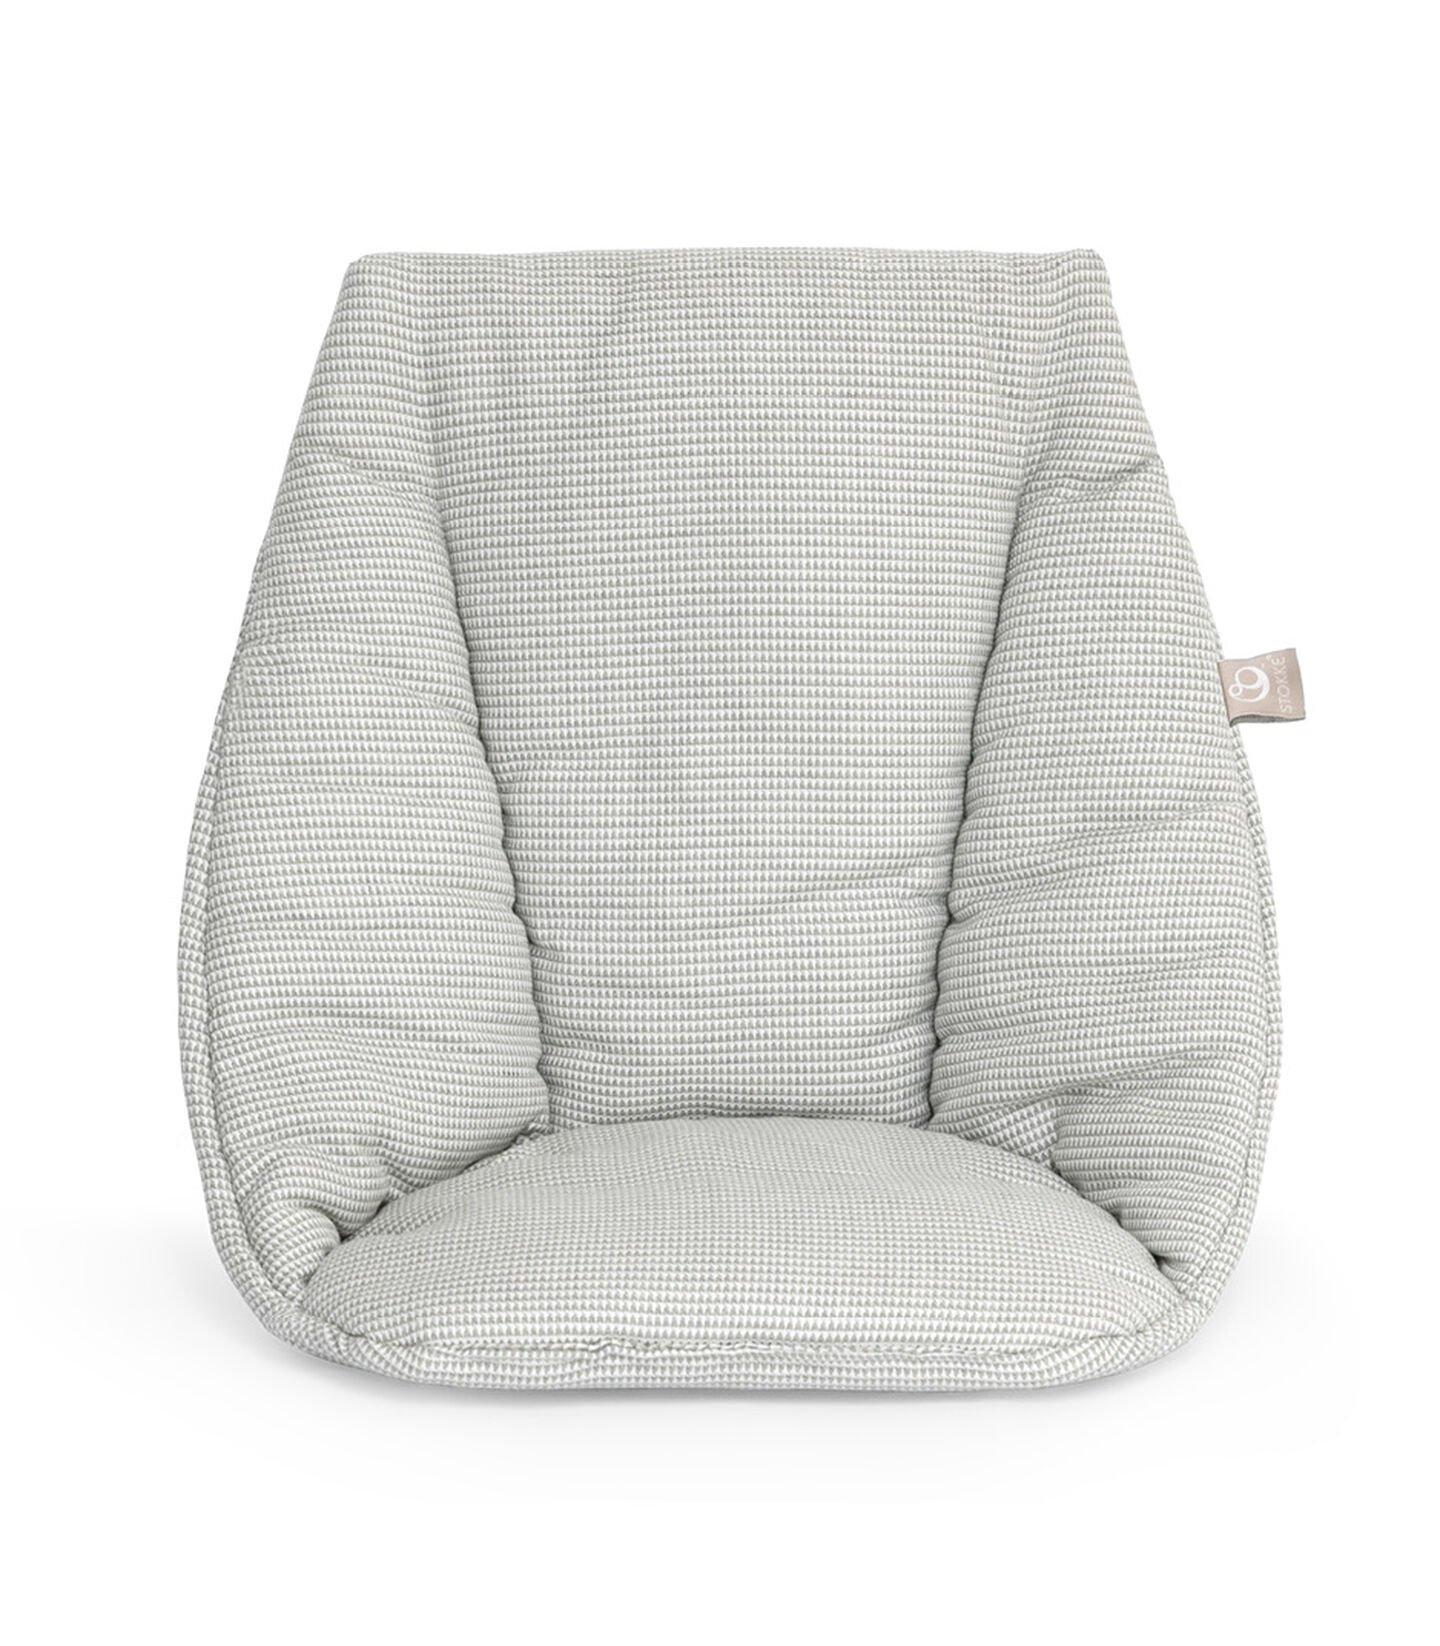 Tripp Trapp® Baby Cushion Nordic Grey. view 1